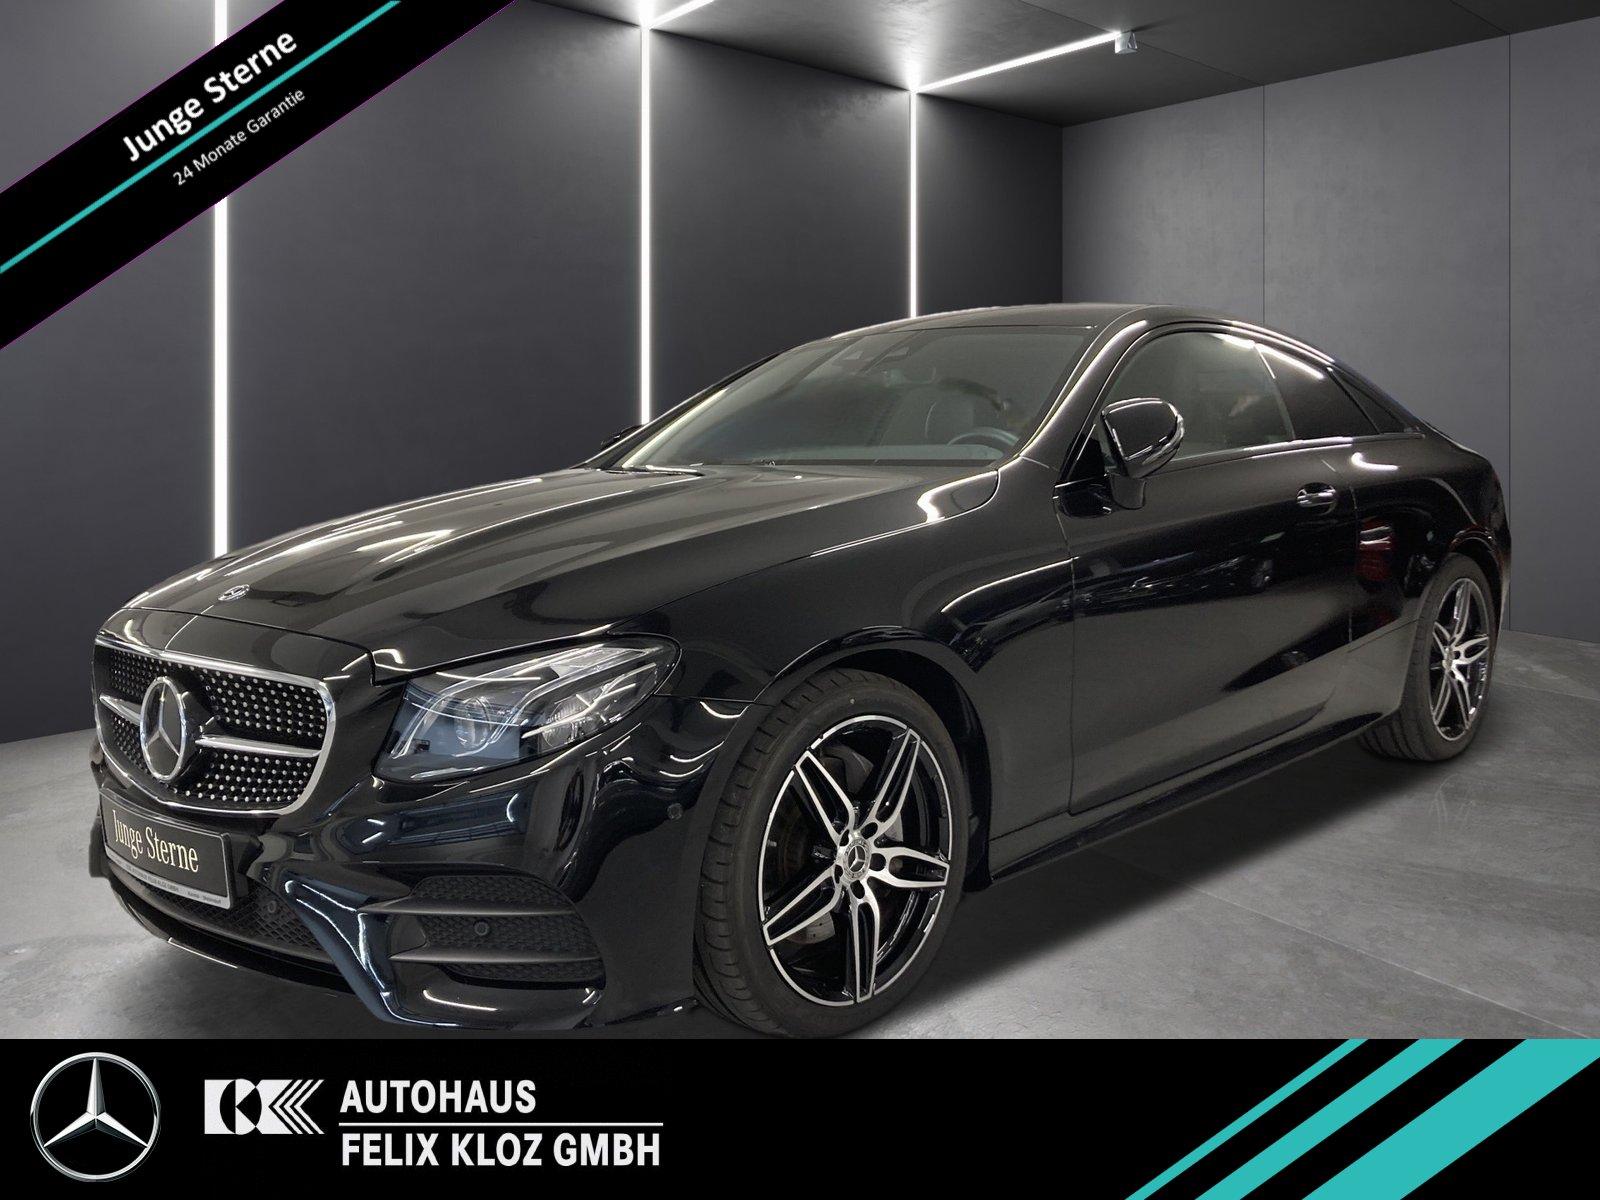 Mercedes-Benz E 300 d Coupe AMG*Navi*Distronic*MultiB*Standhei, Jahr 2020, Diesel